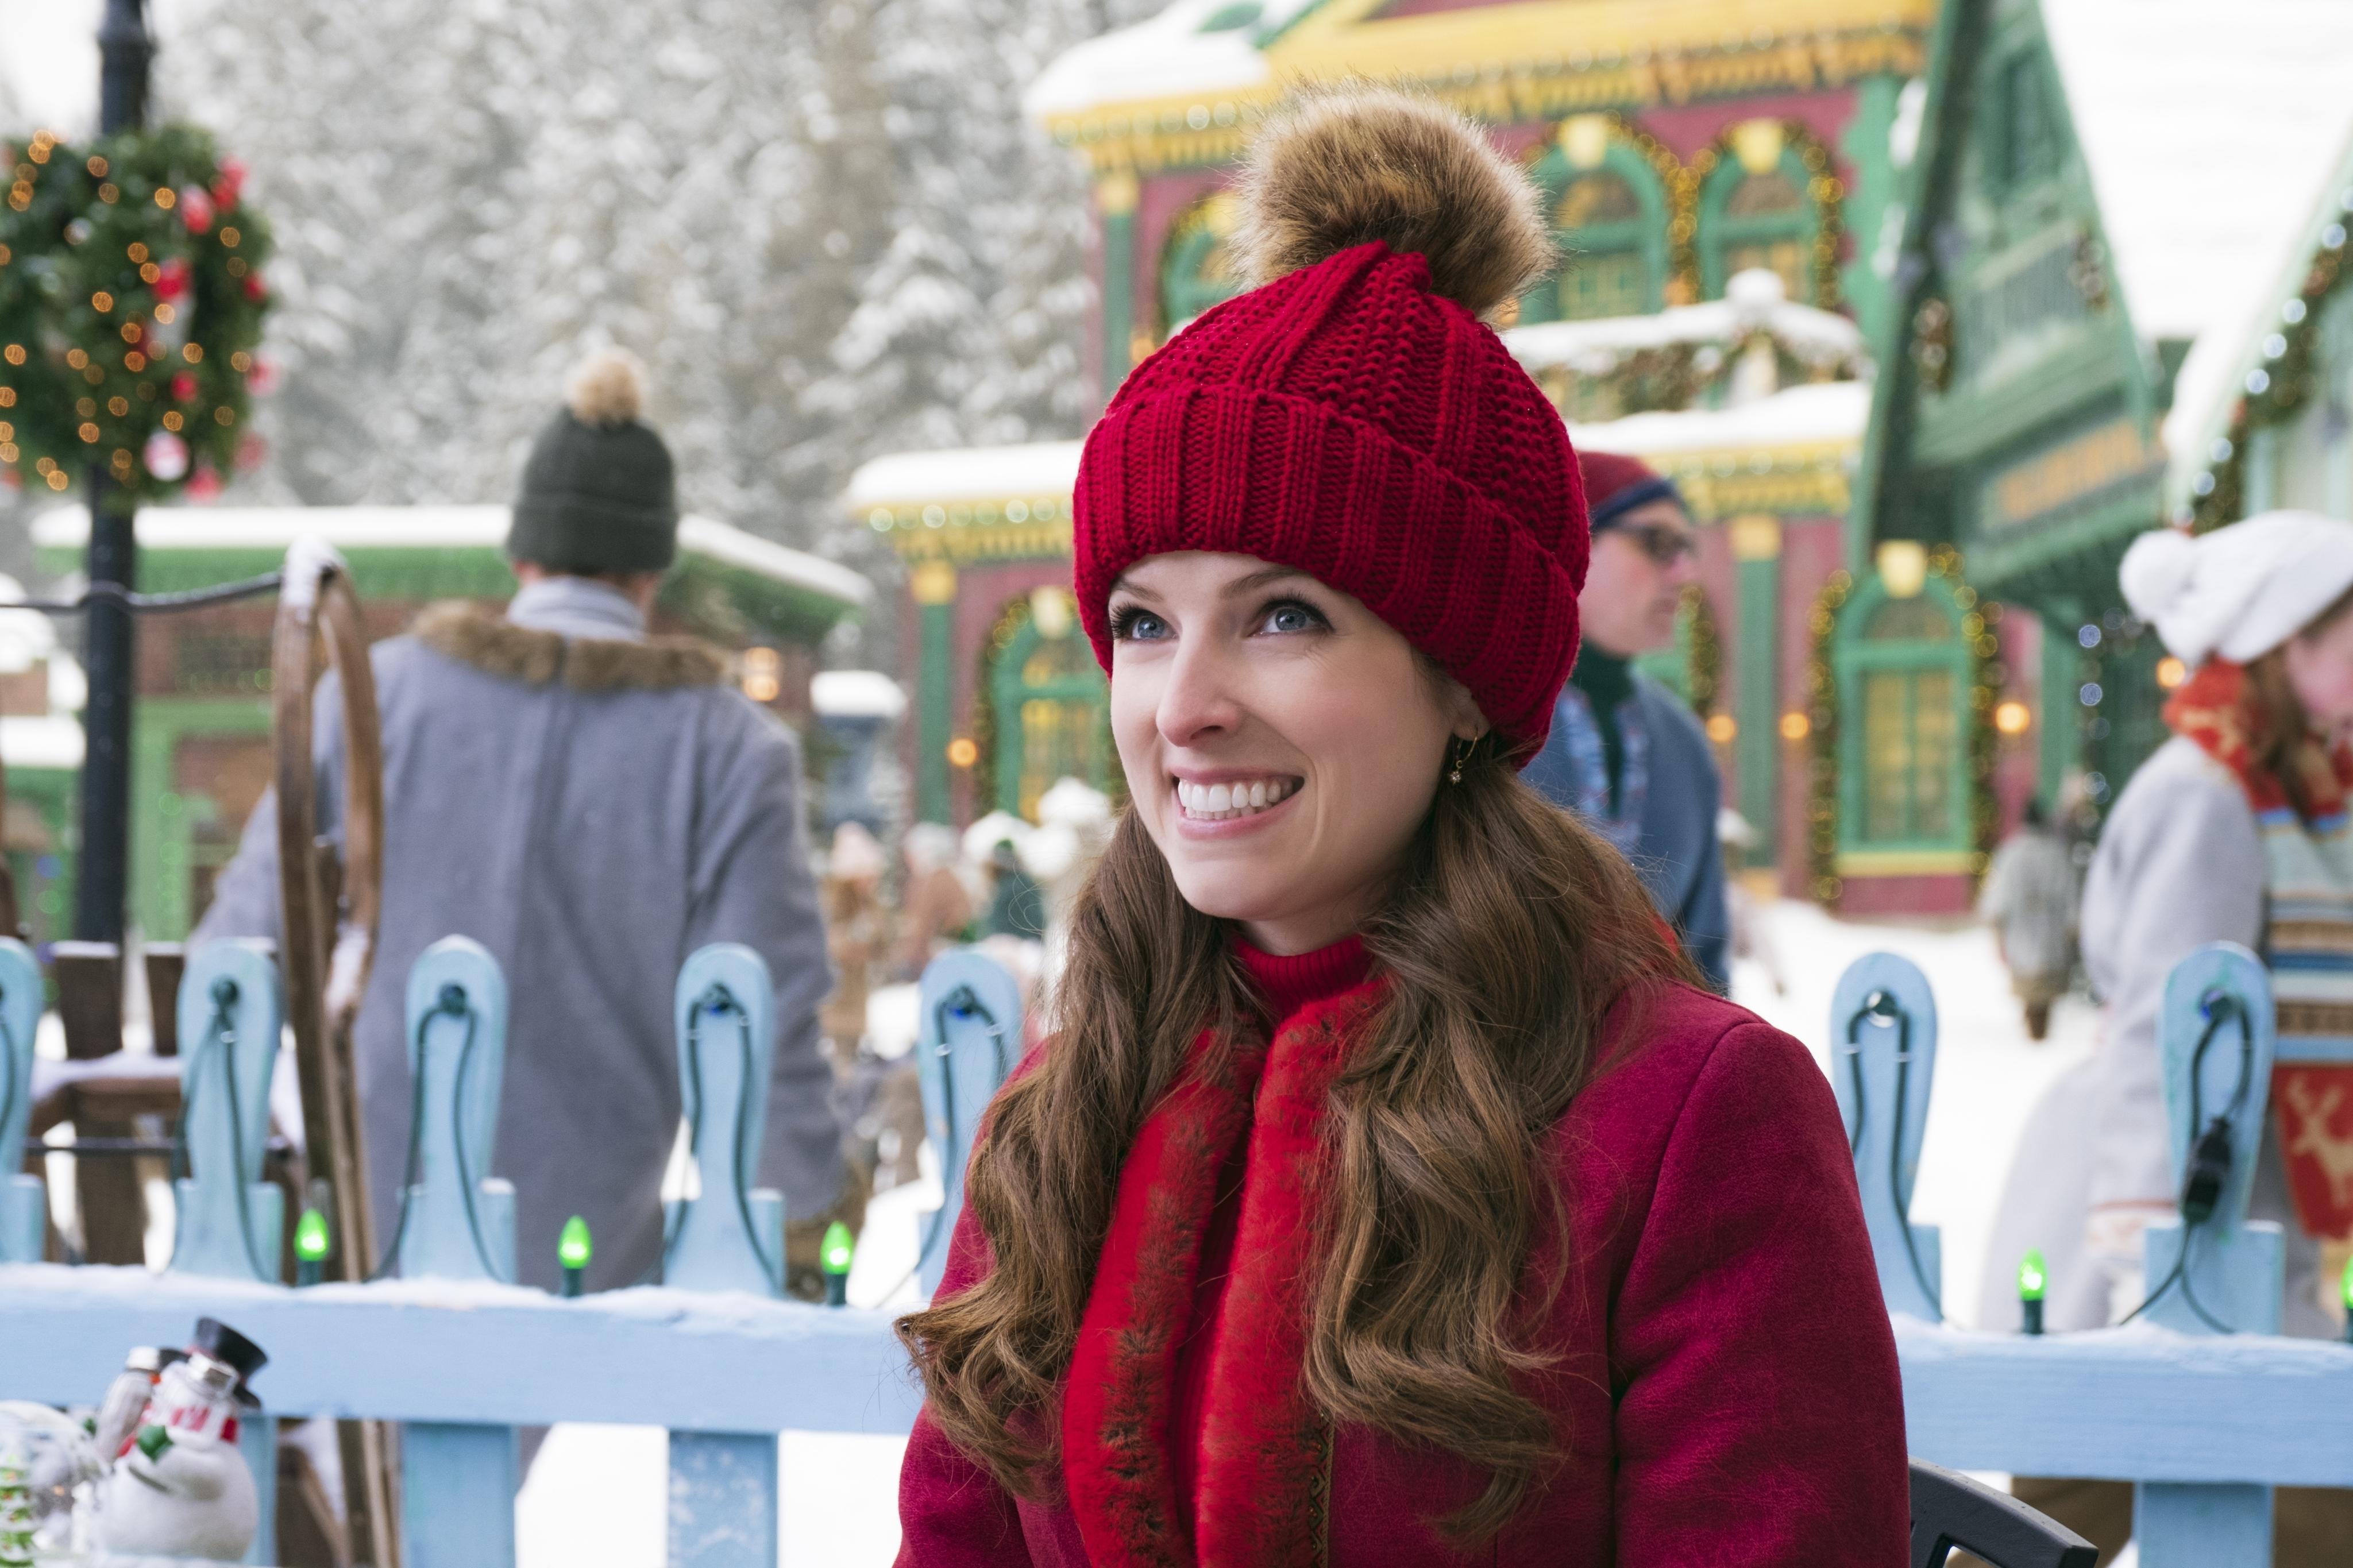 The best part of the Disney Plus movie Noelle verges into Black Mirror territory